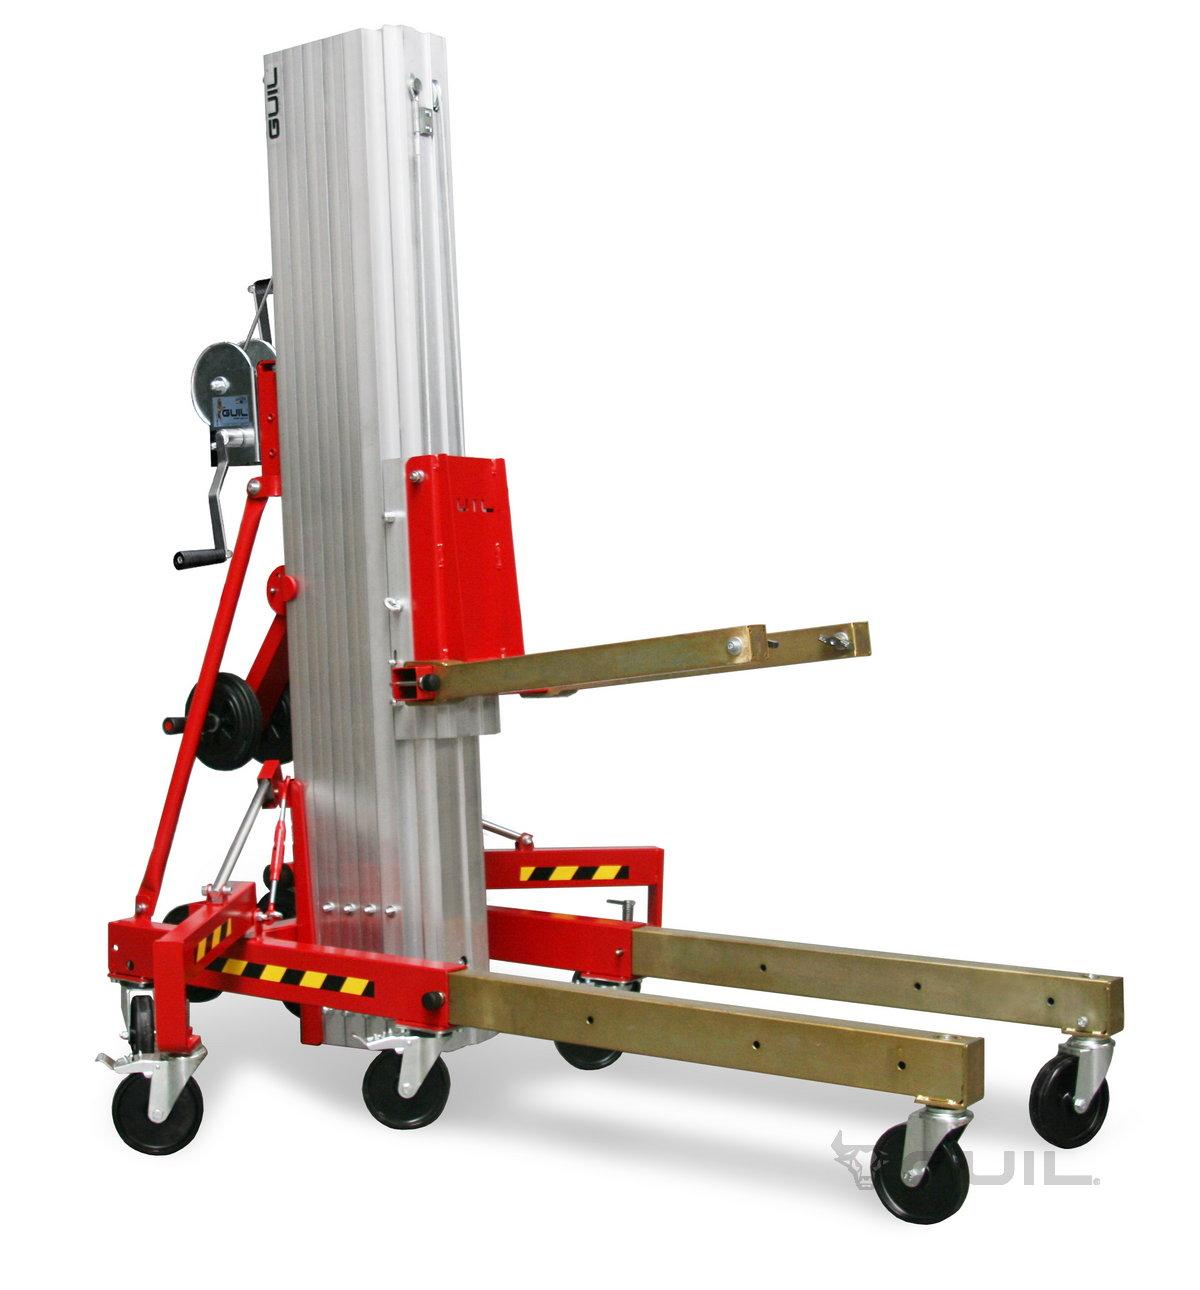 Kanaallift 6,5 m 400 kg (dutch) (1)